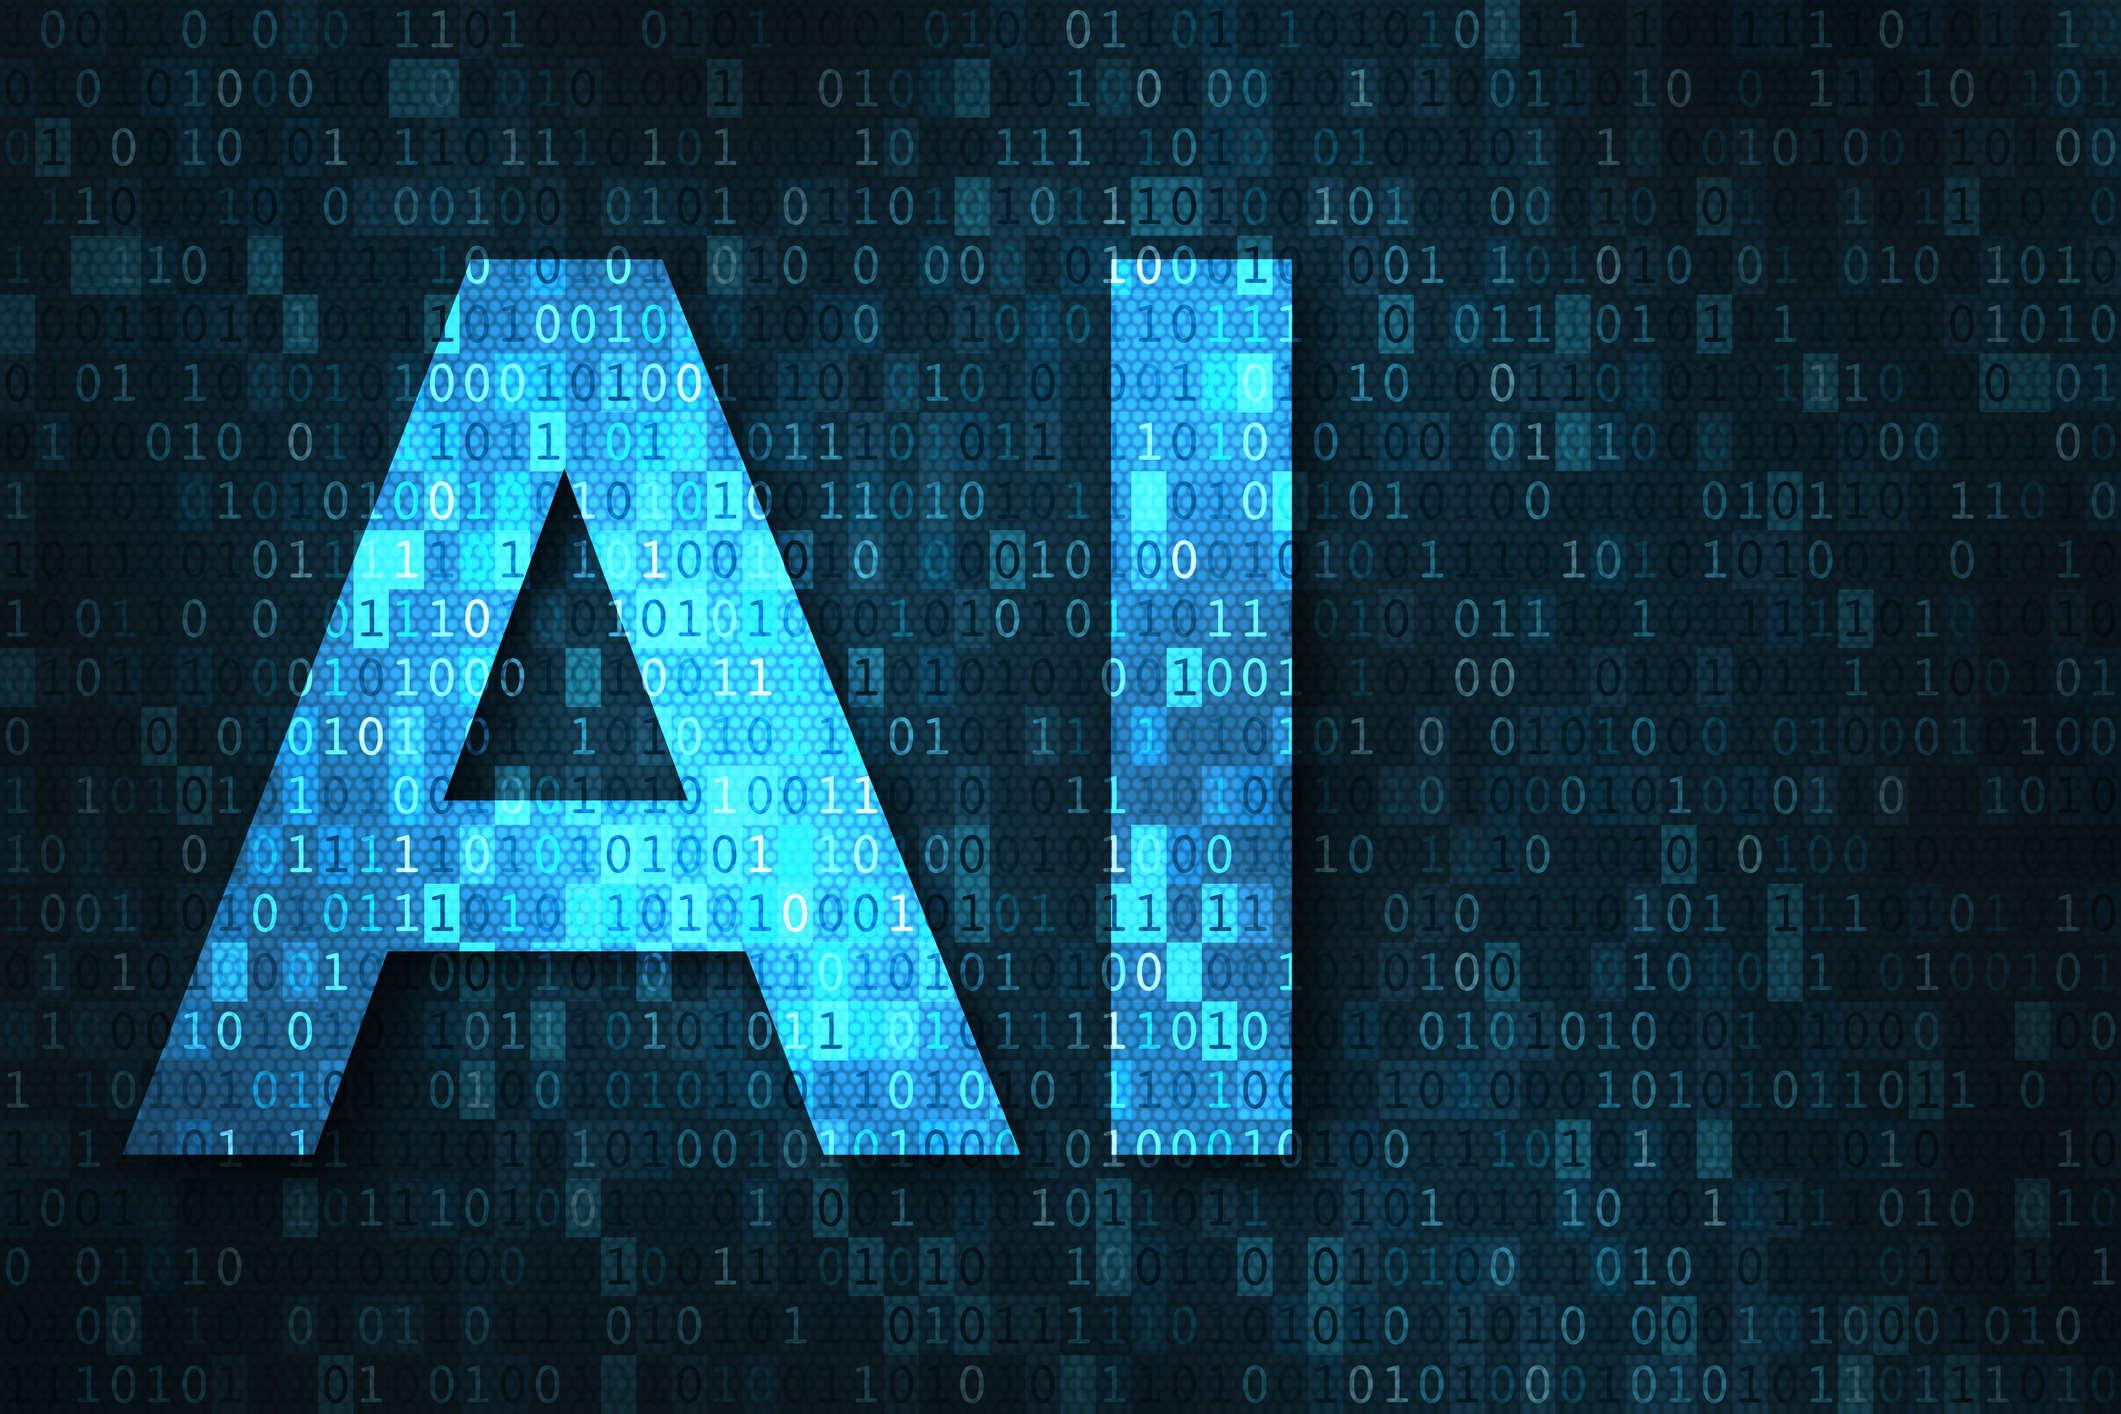 Artificial Intelligence will not take away jobs: Expert